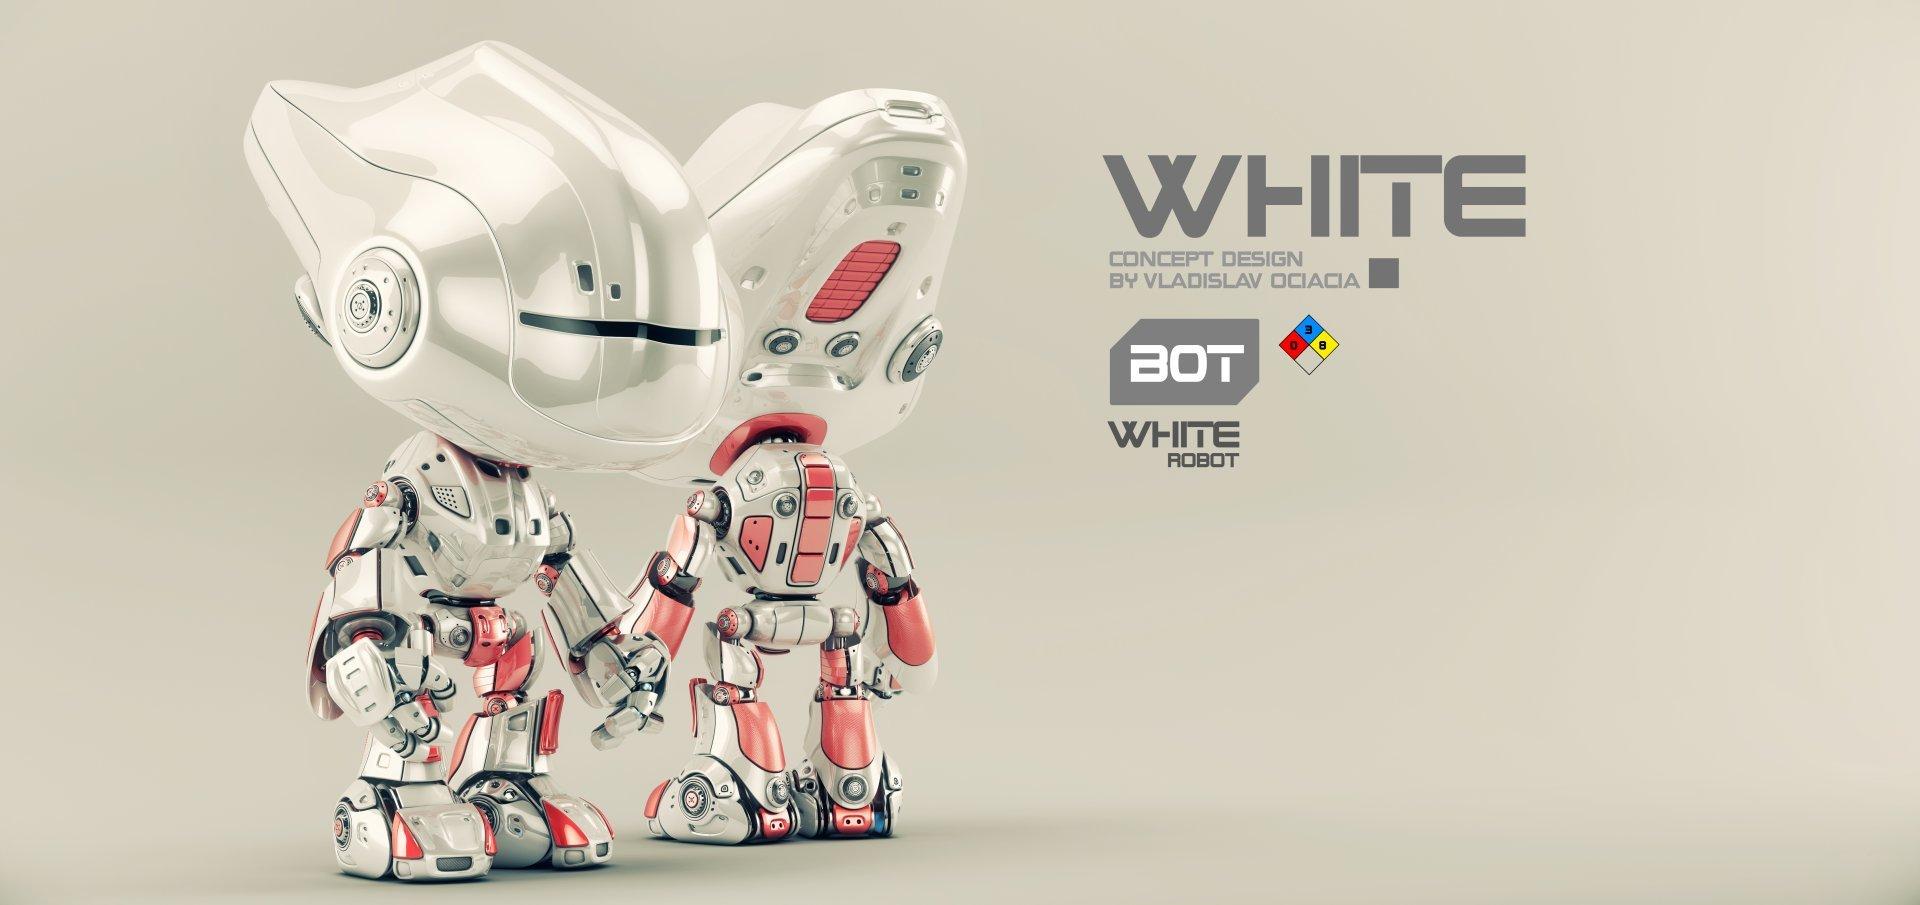 Vladislav ociacia white bot 7